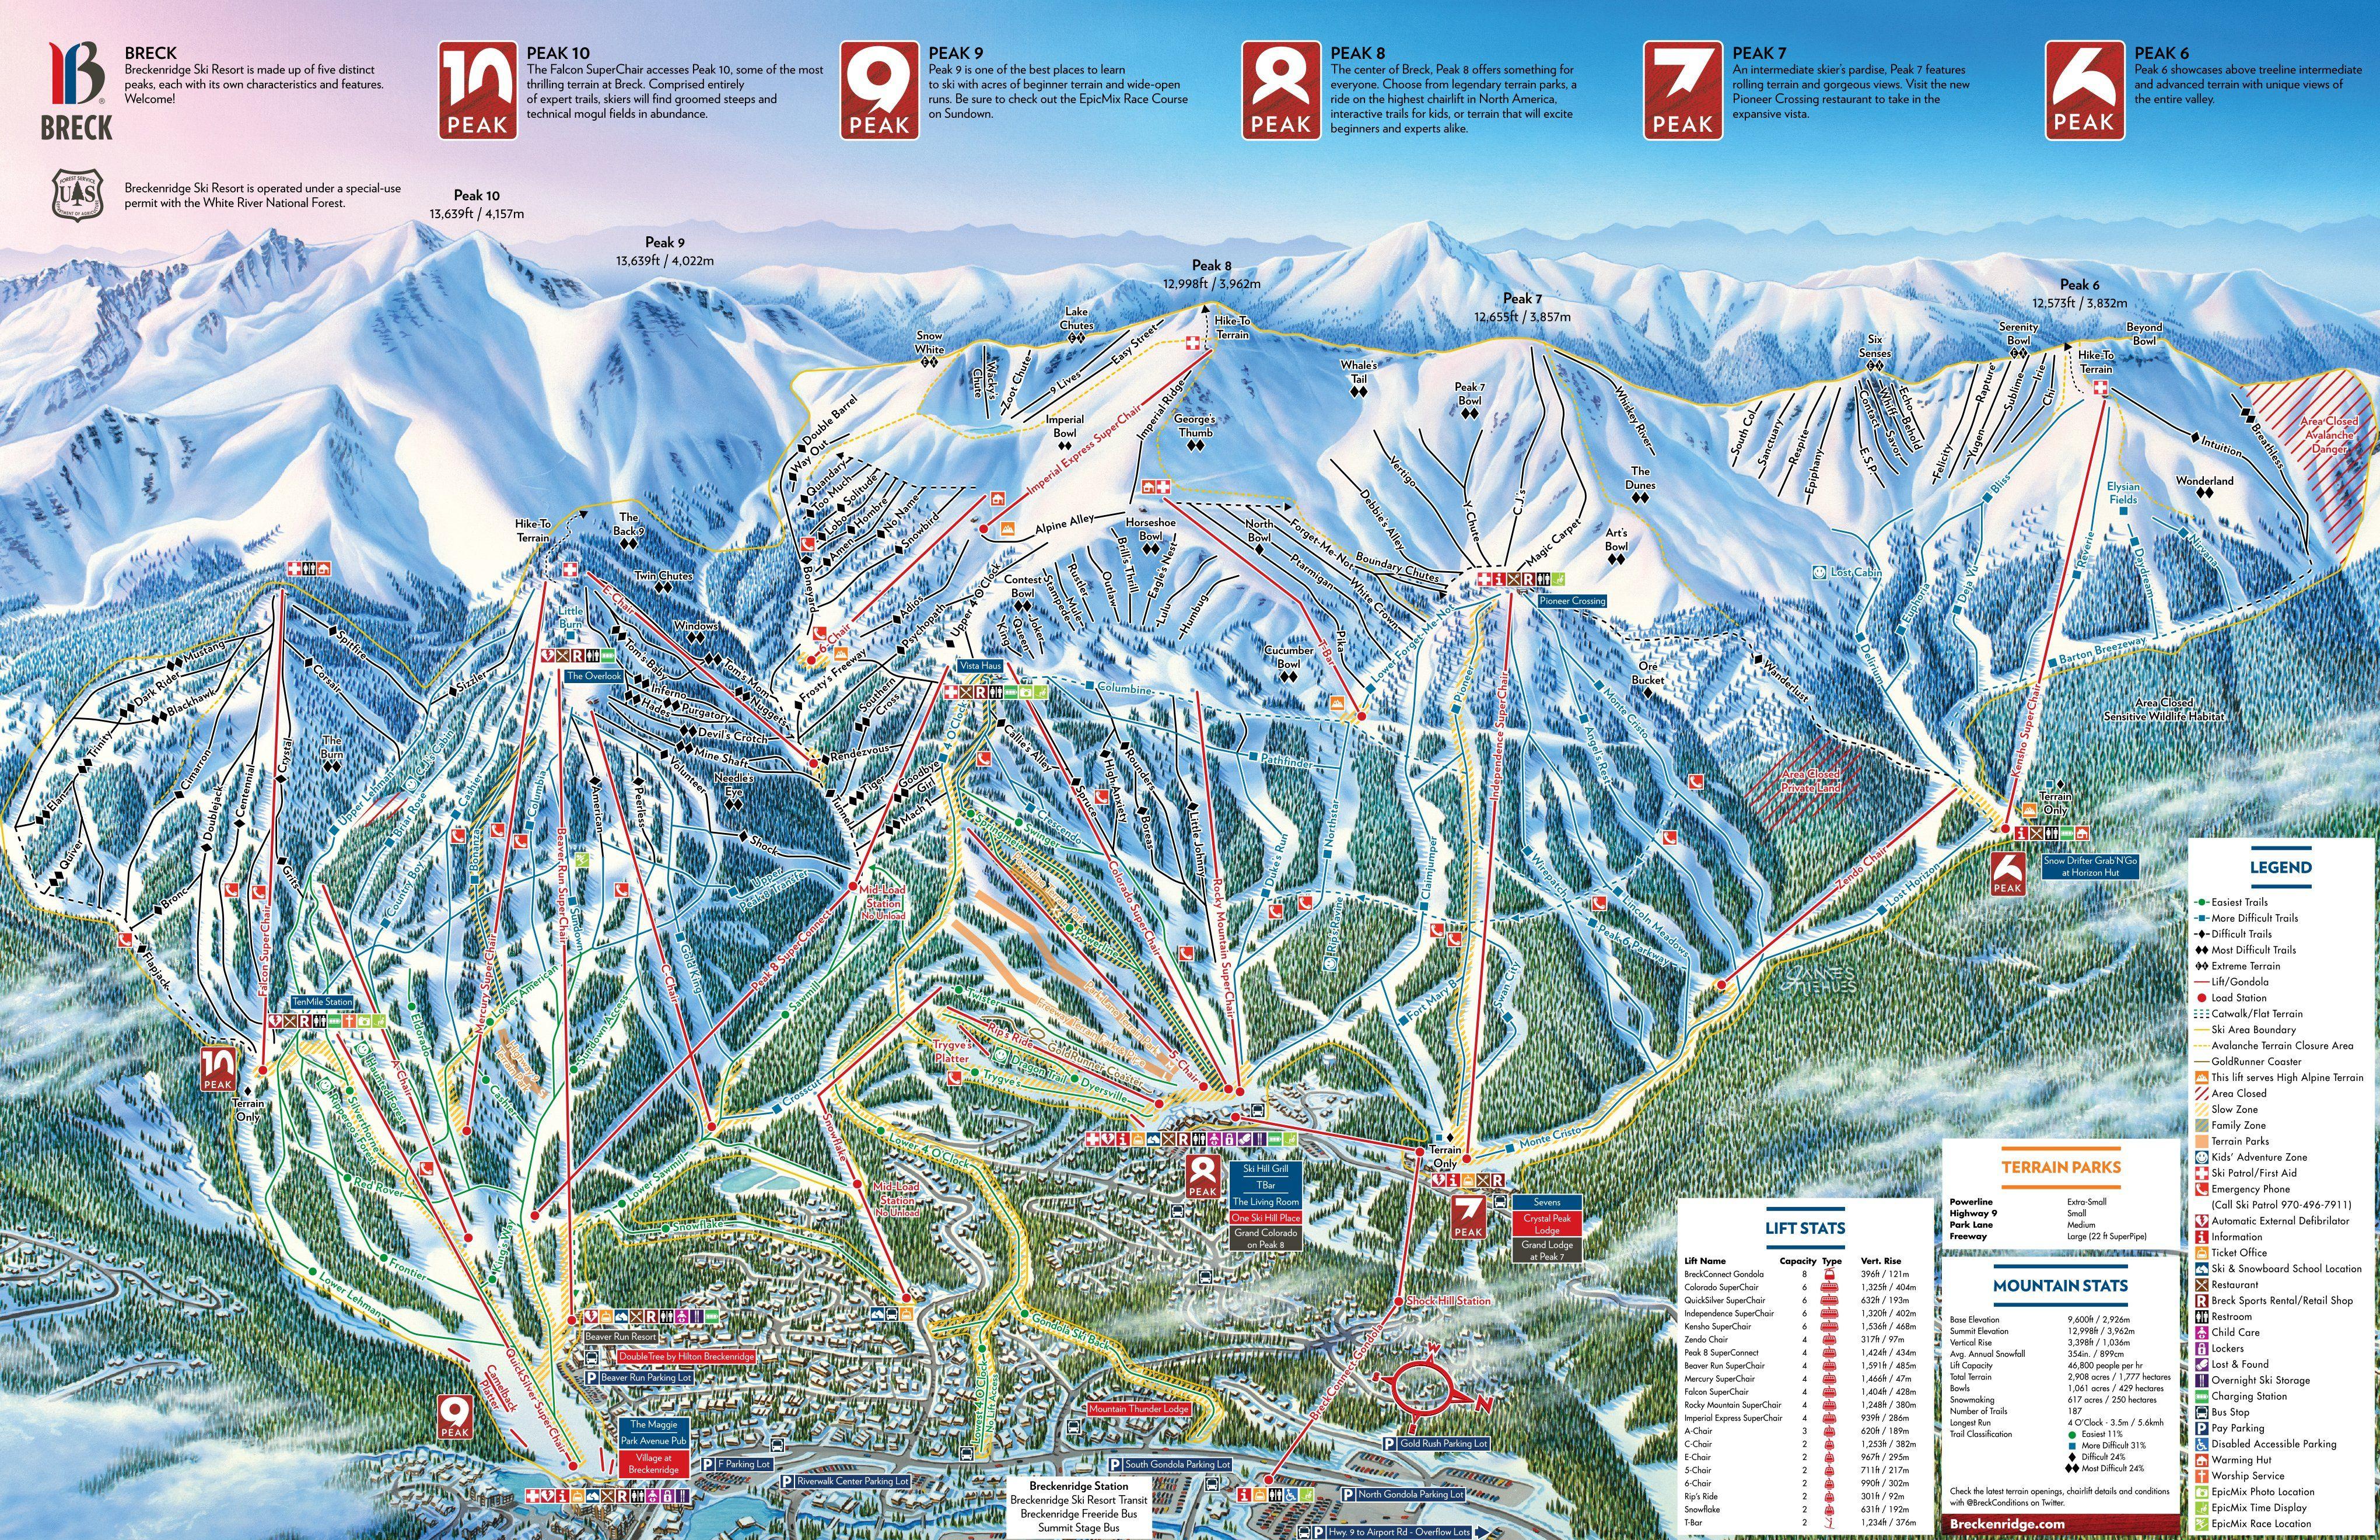 Breckenridge Breckenridge Ski Resort Ski Breckenridge Colorado Snowboarding